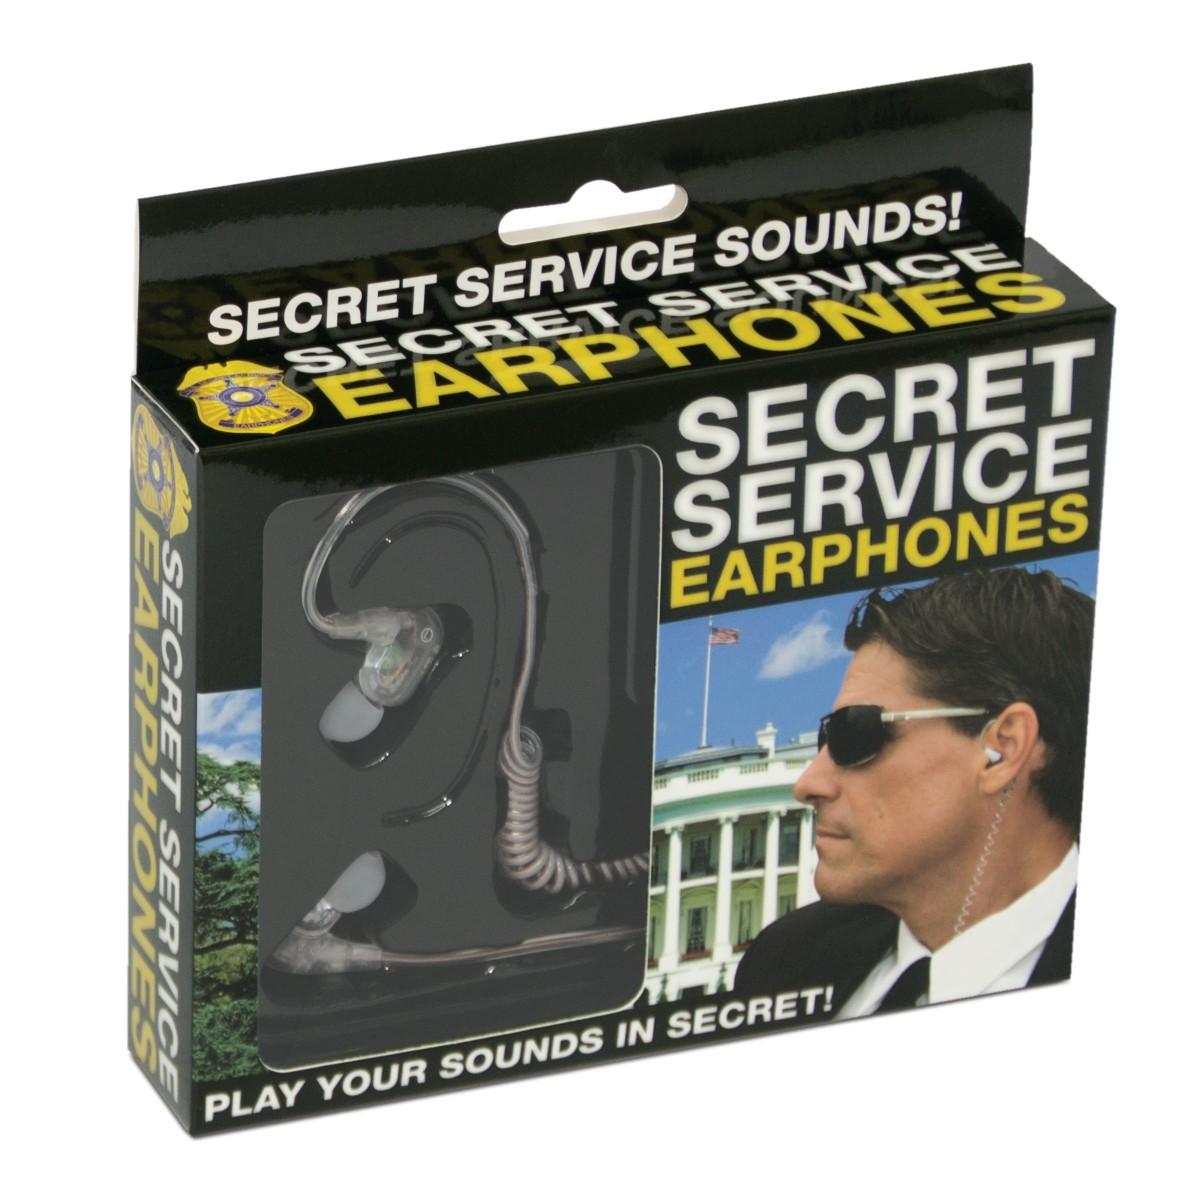 Secret Service Kopfhörer